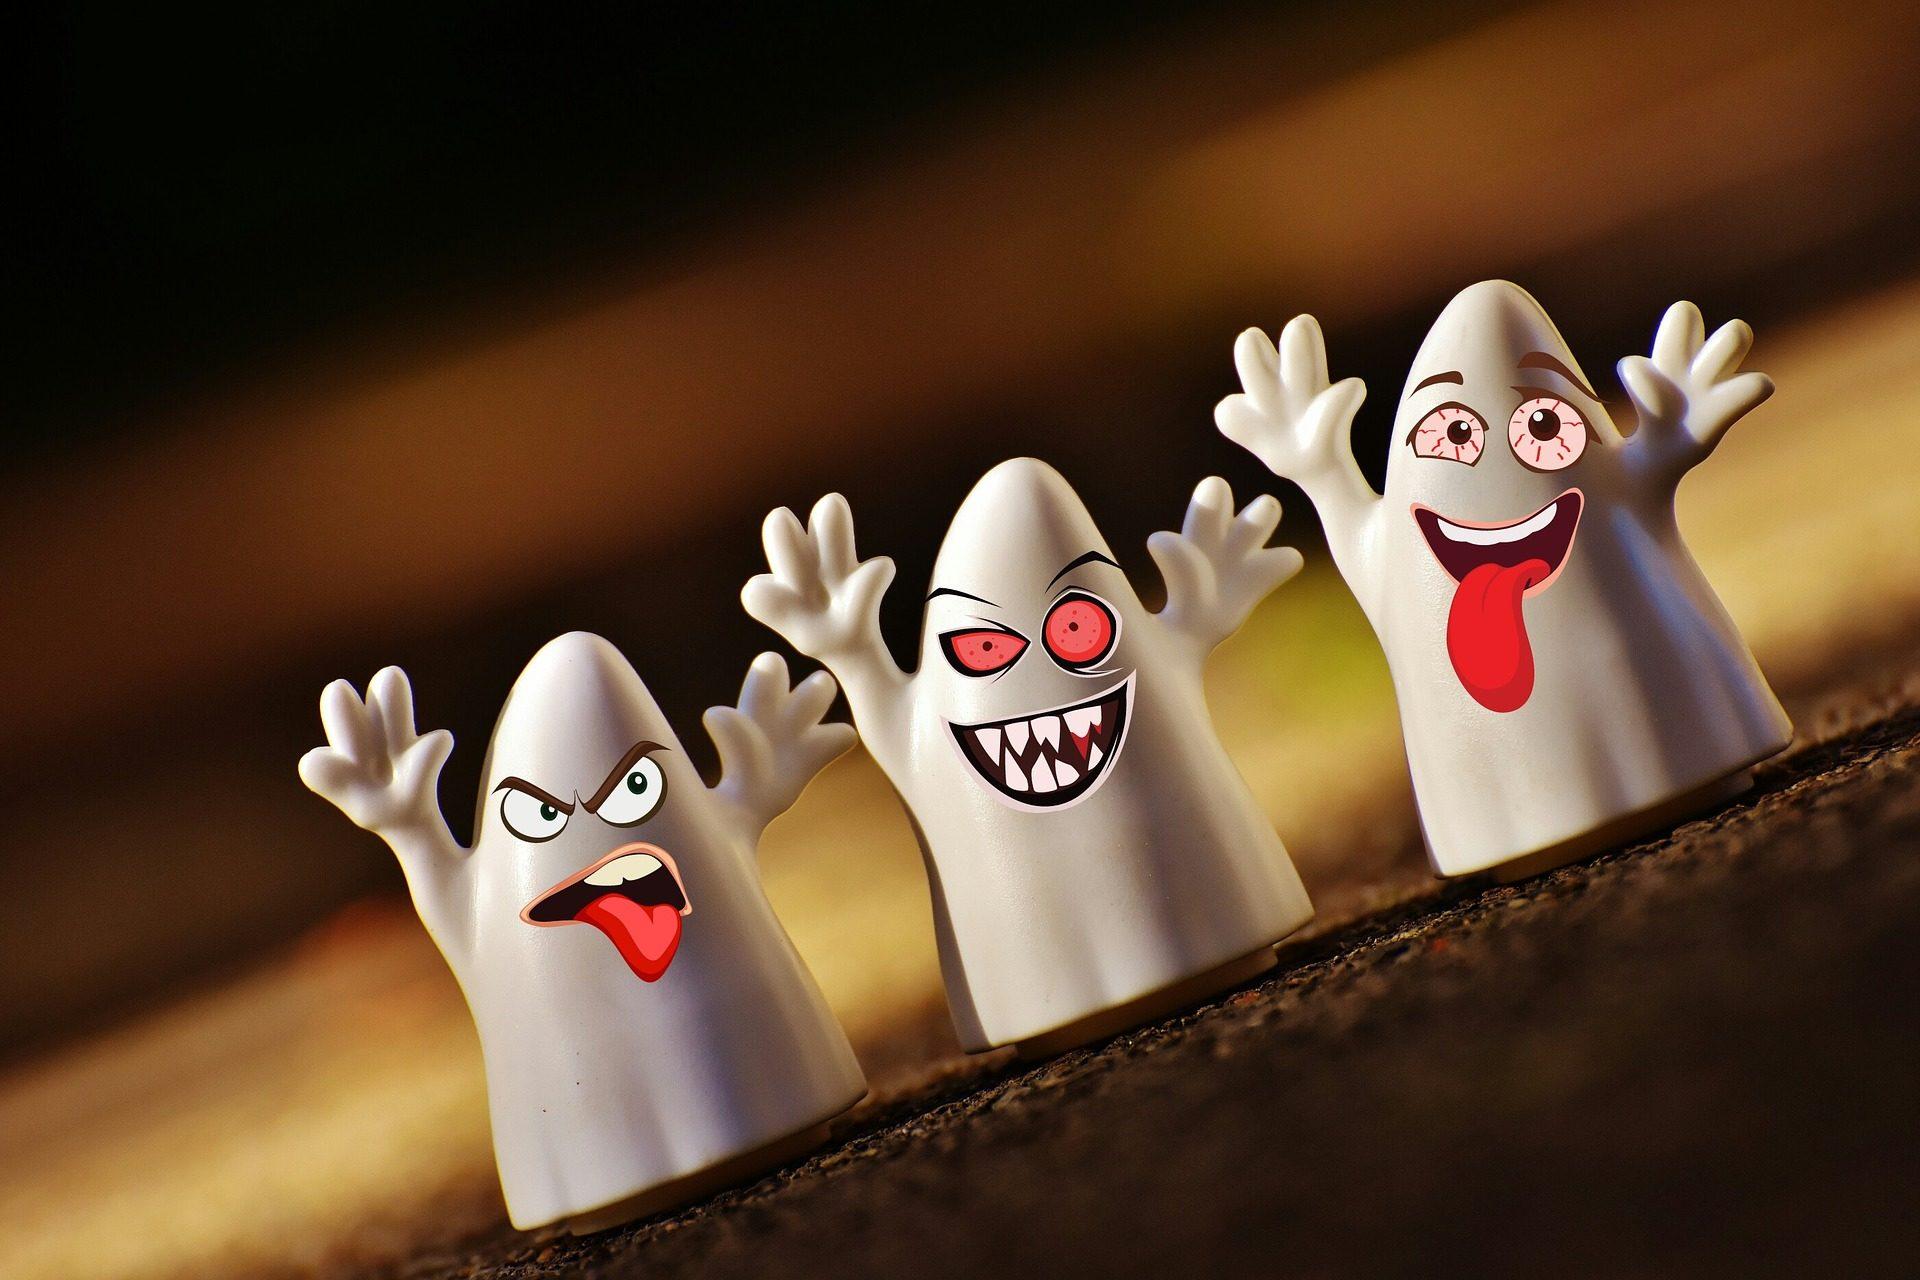 fantasmas, caras, burlas, risas, halloween, divertido - Fondos de Pantalla HD - professor-falken.com